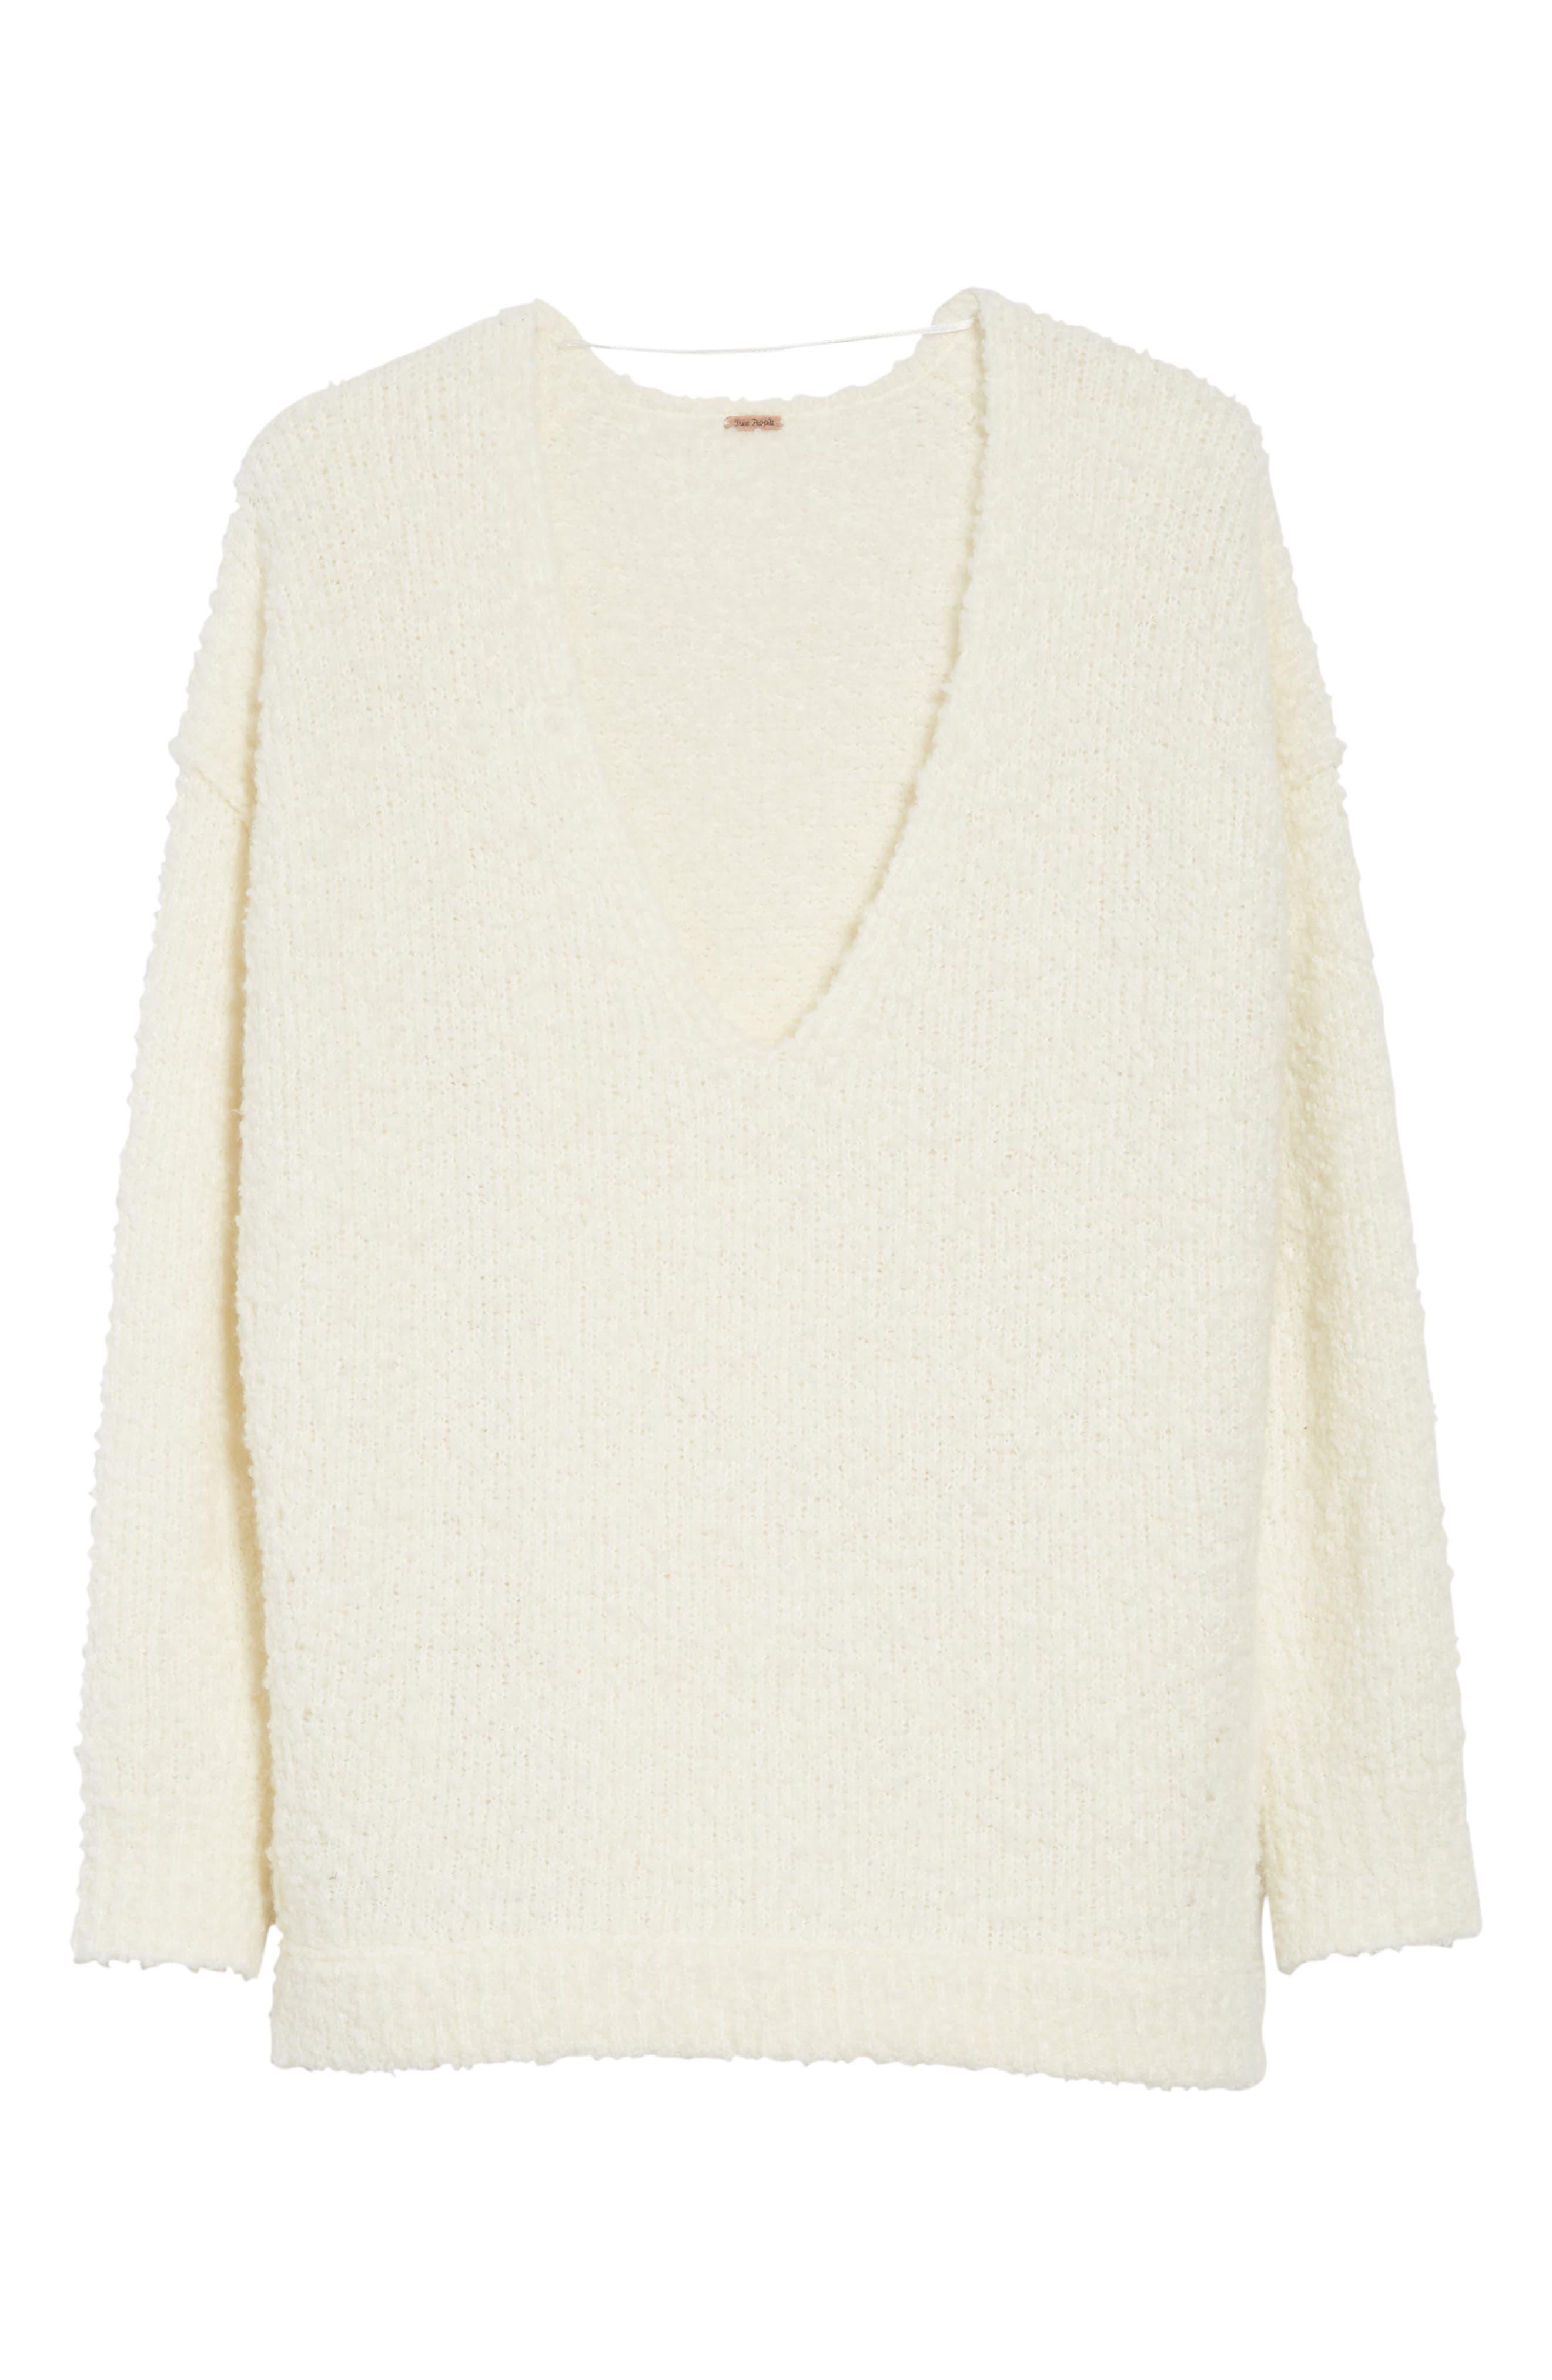 Lofty V-Neck Sweater,                             Alternate thumbnail 40, color,